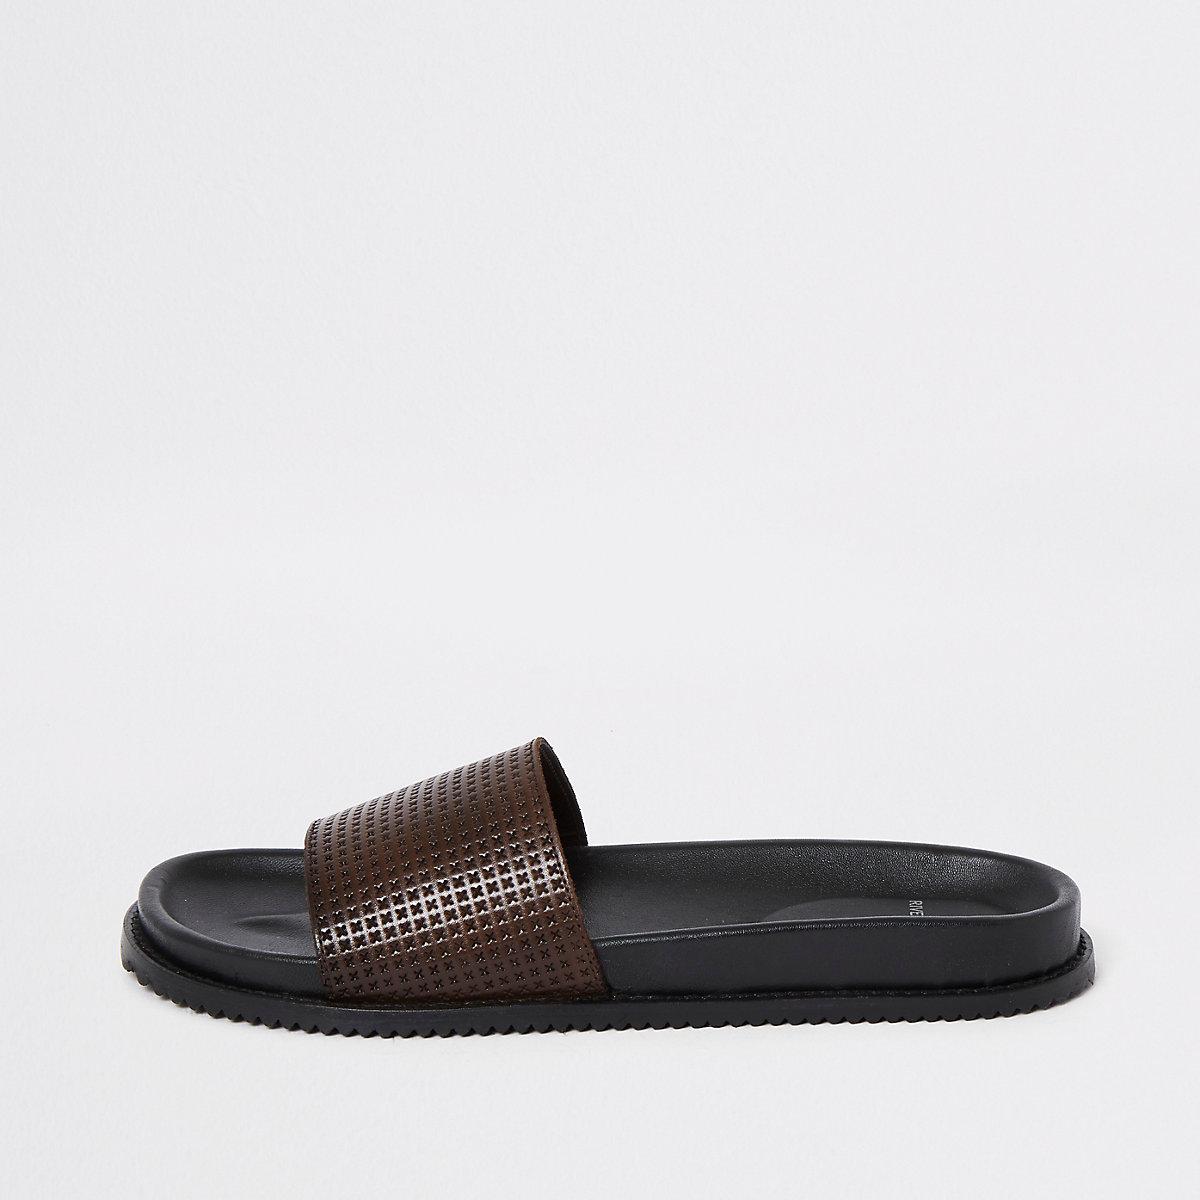 Brown leather sliders